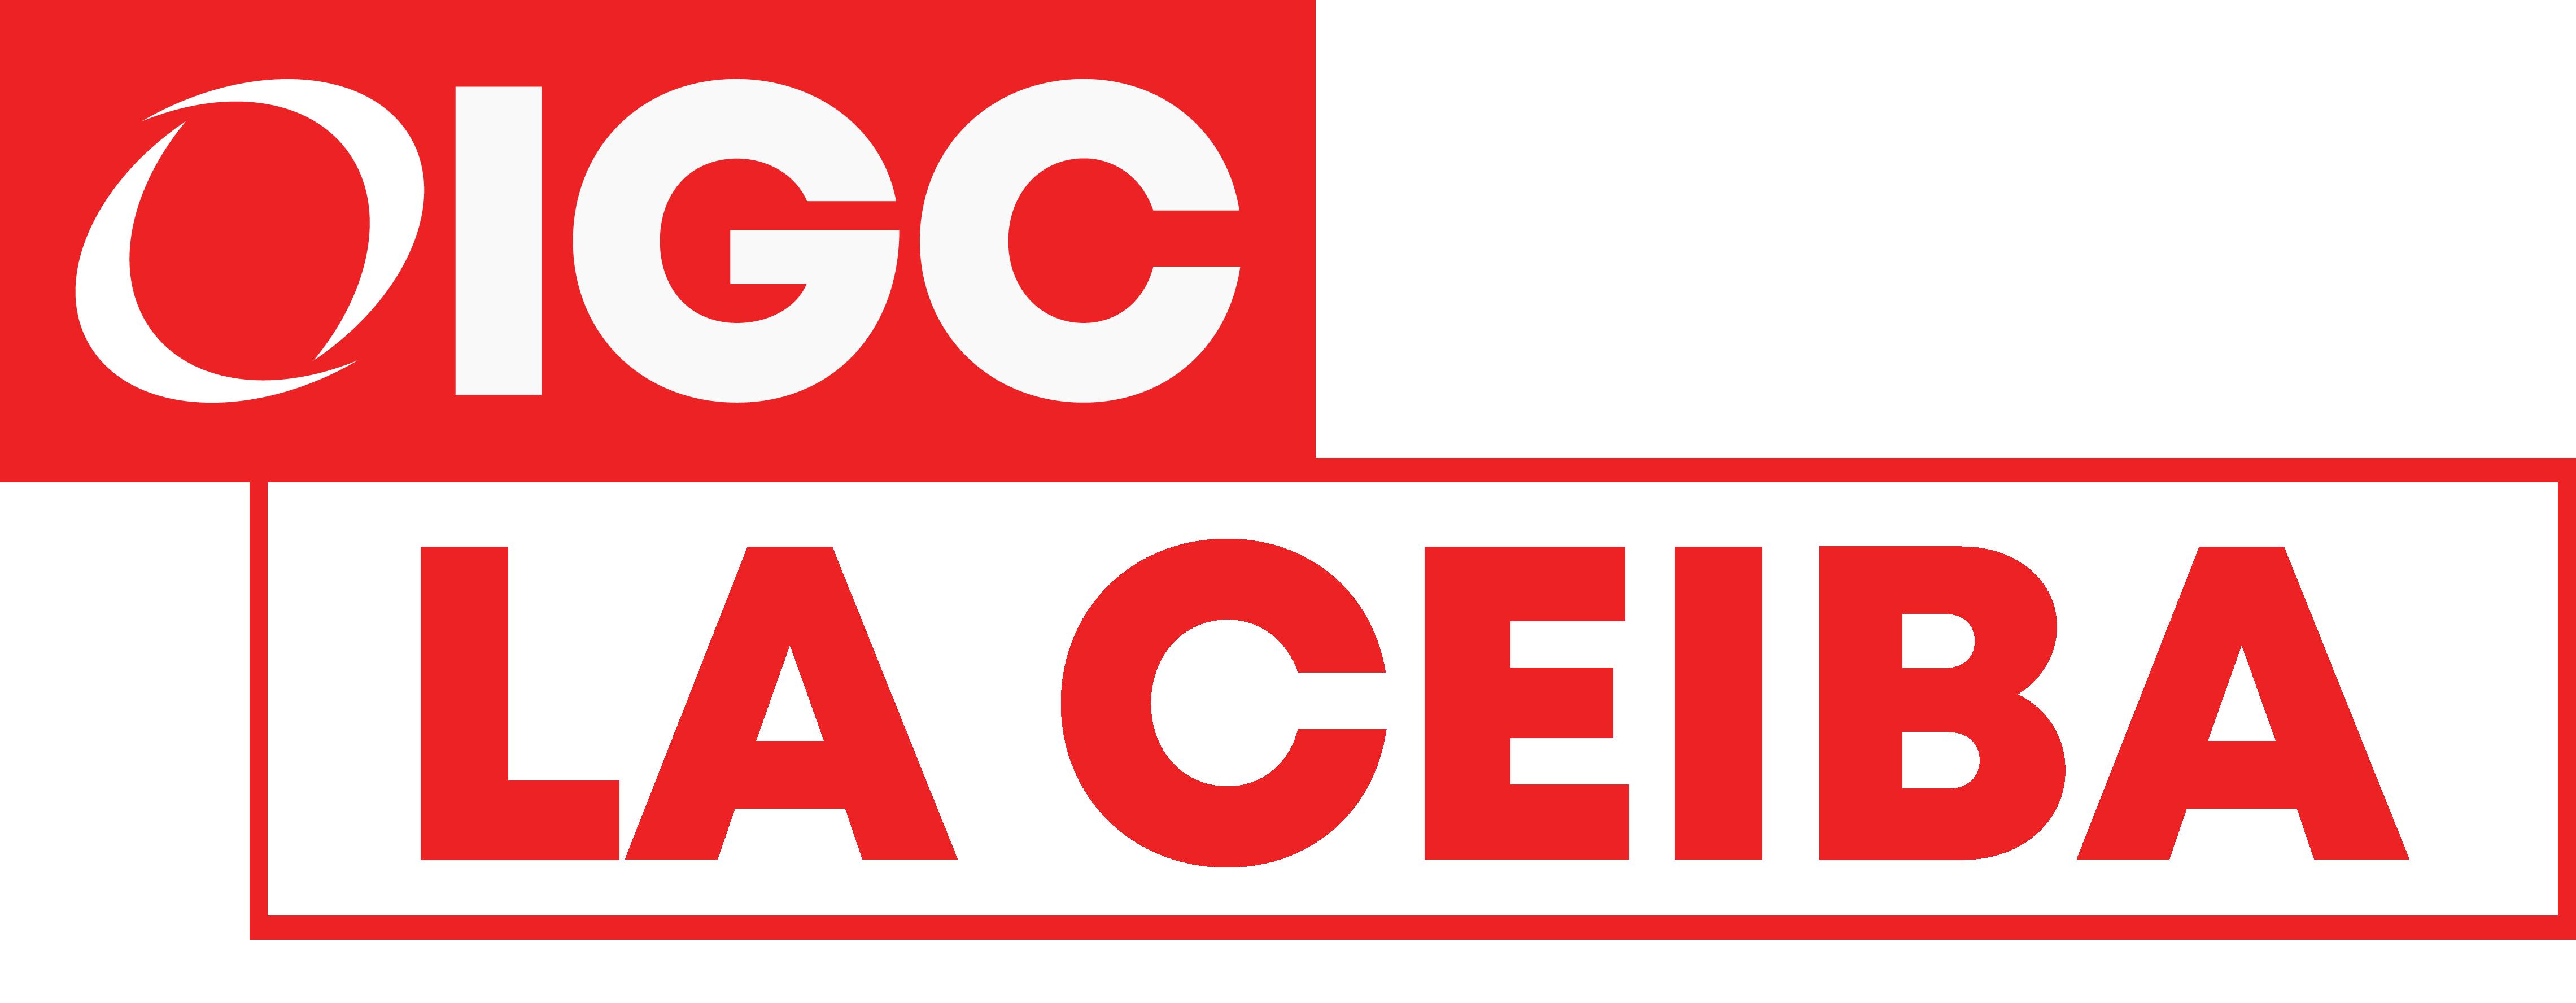 Iglesia Gran Comisión La Ceiba